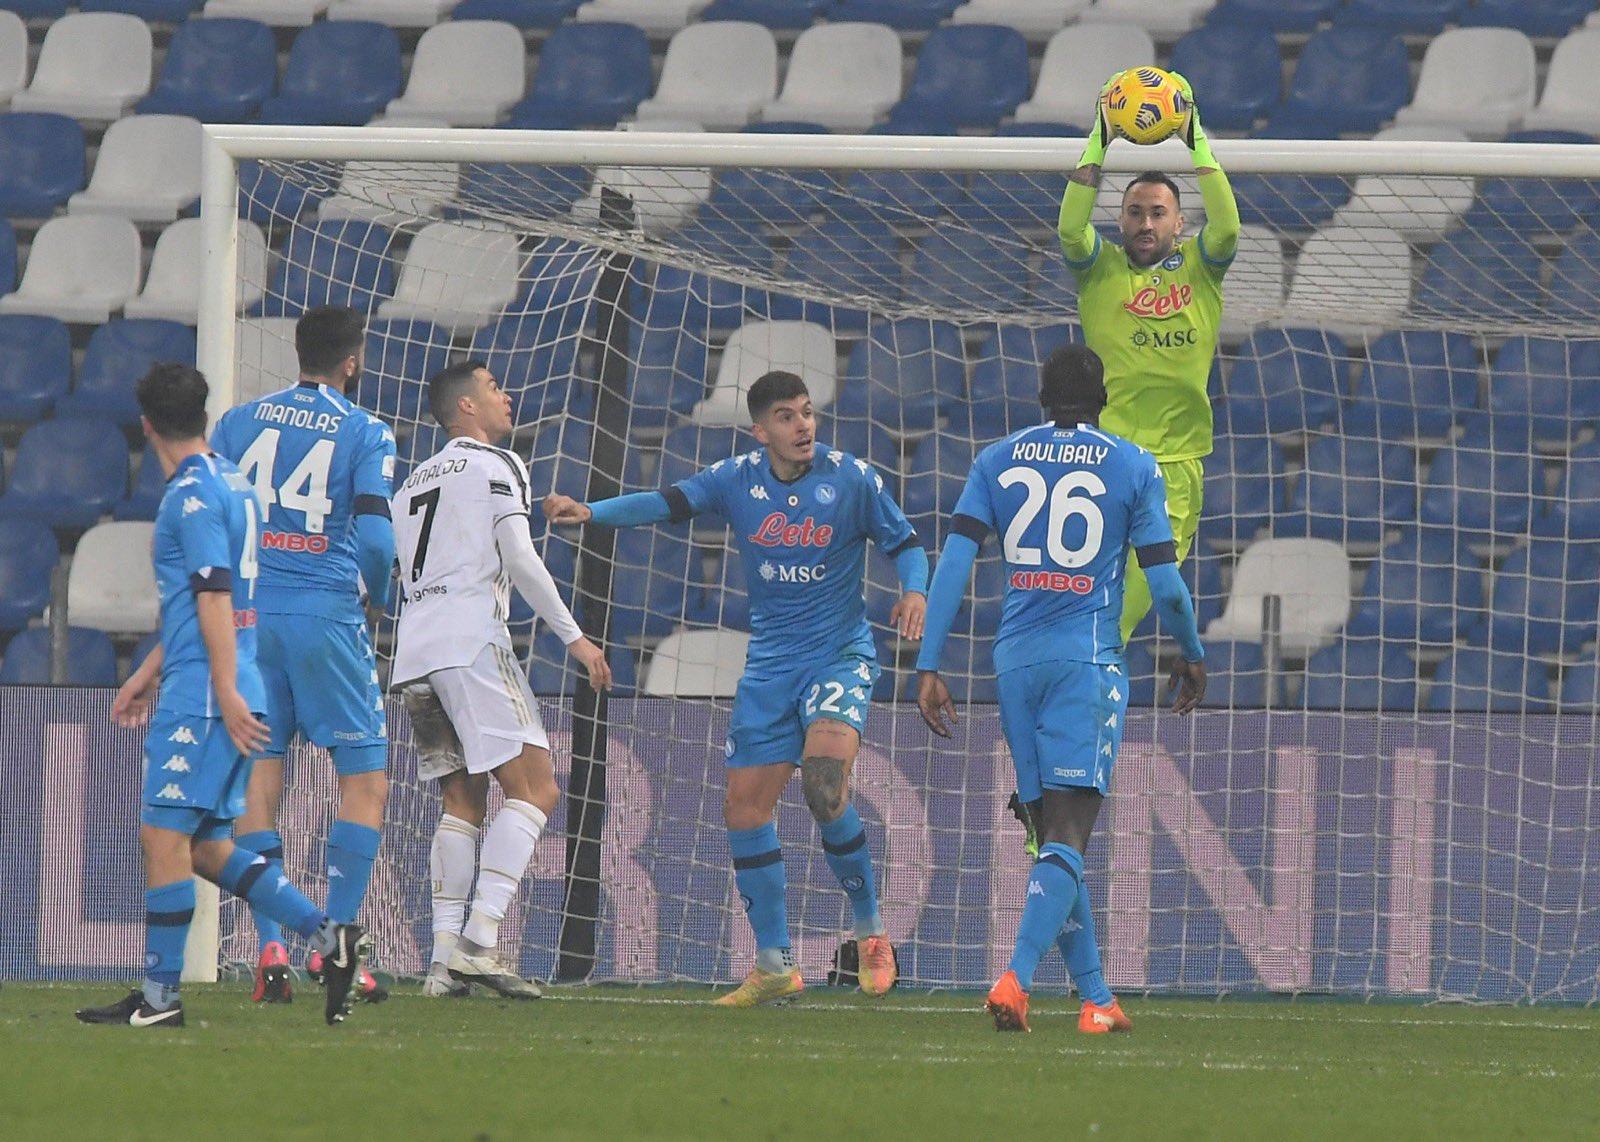 Supercoppa, vince la Juventus: Napoli battuto 2-0. Decidono Ronaldo e Morata